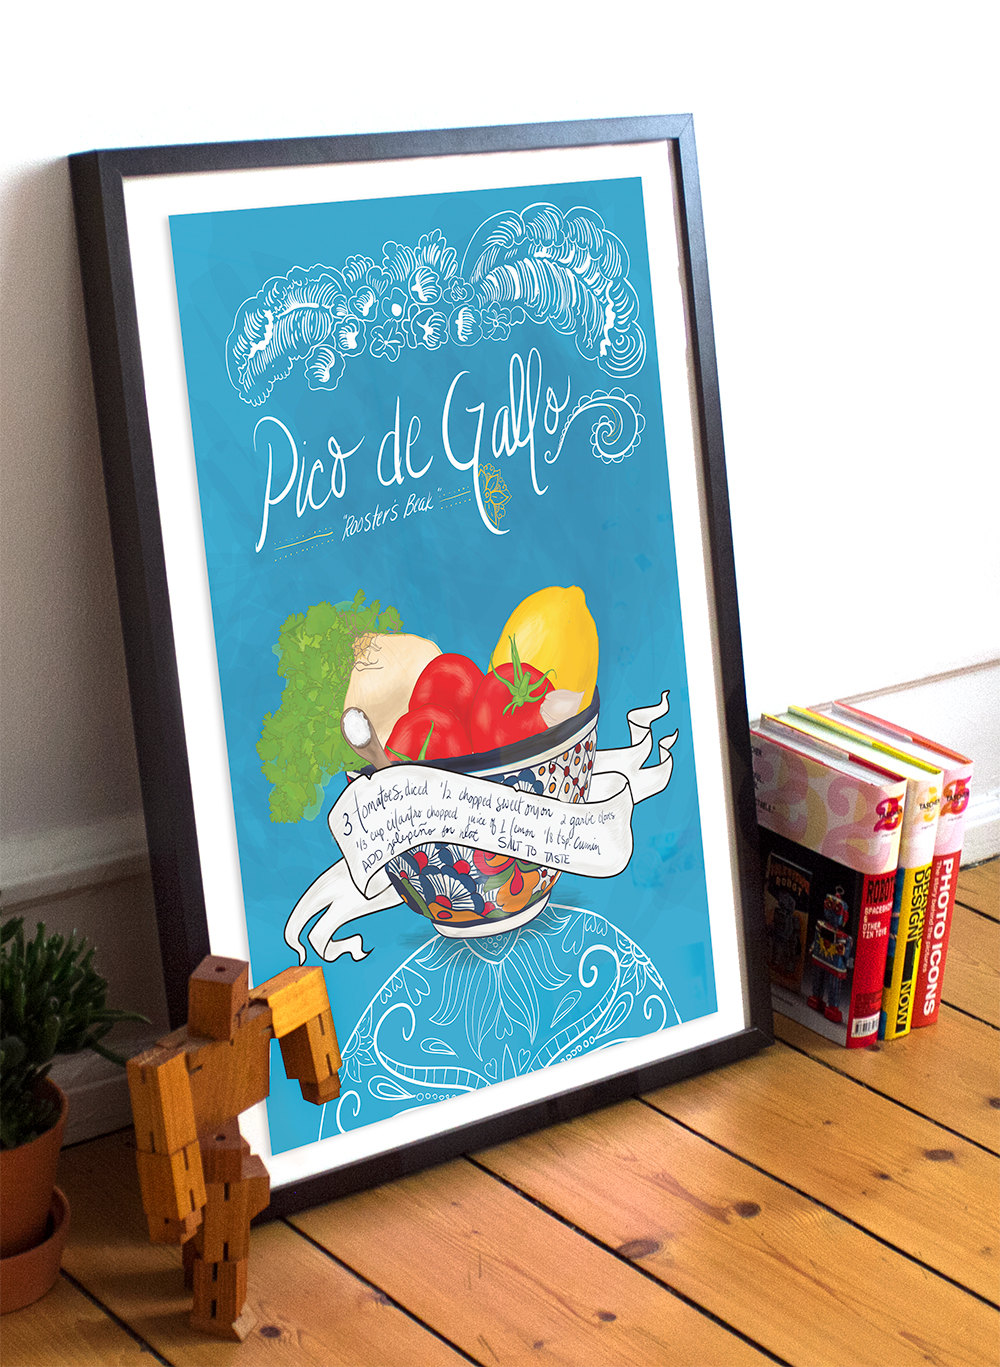 Pico De Gallo Recipe Mexican Kitchen Print Illustrated Dia De Los Muertos Salsa Recipe Giclee Cotton Canvas Or Paper Canvas Wall Decor Art Welovecmyk